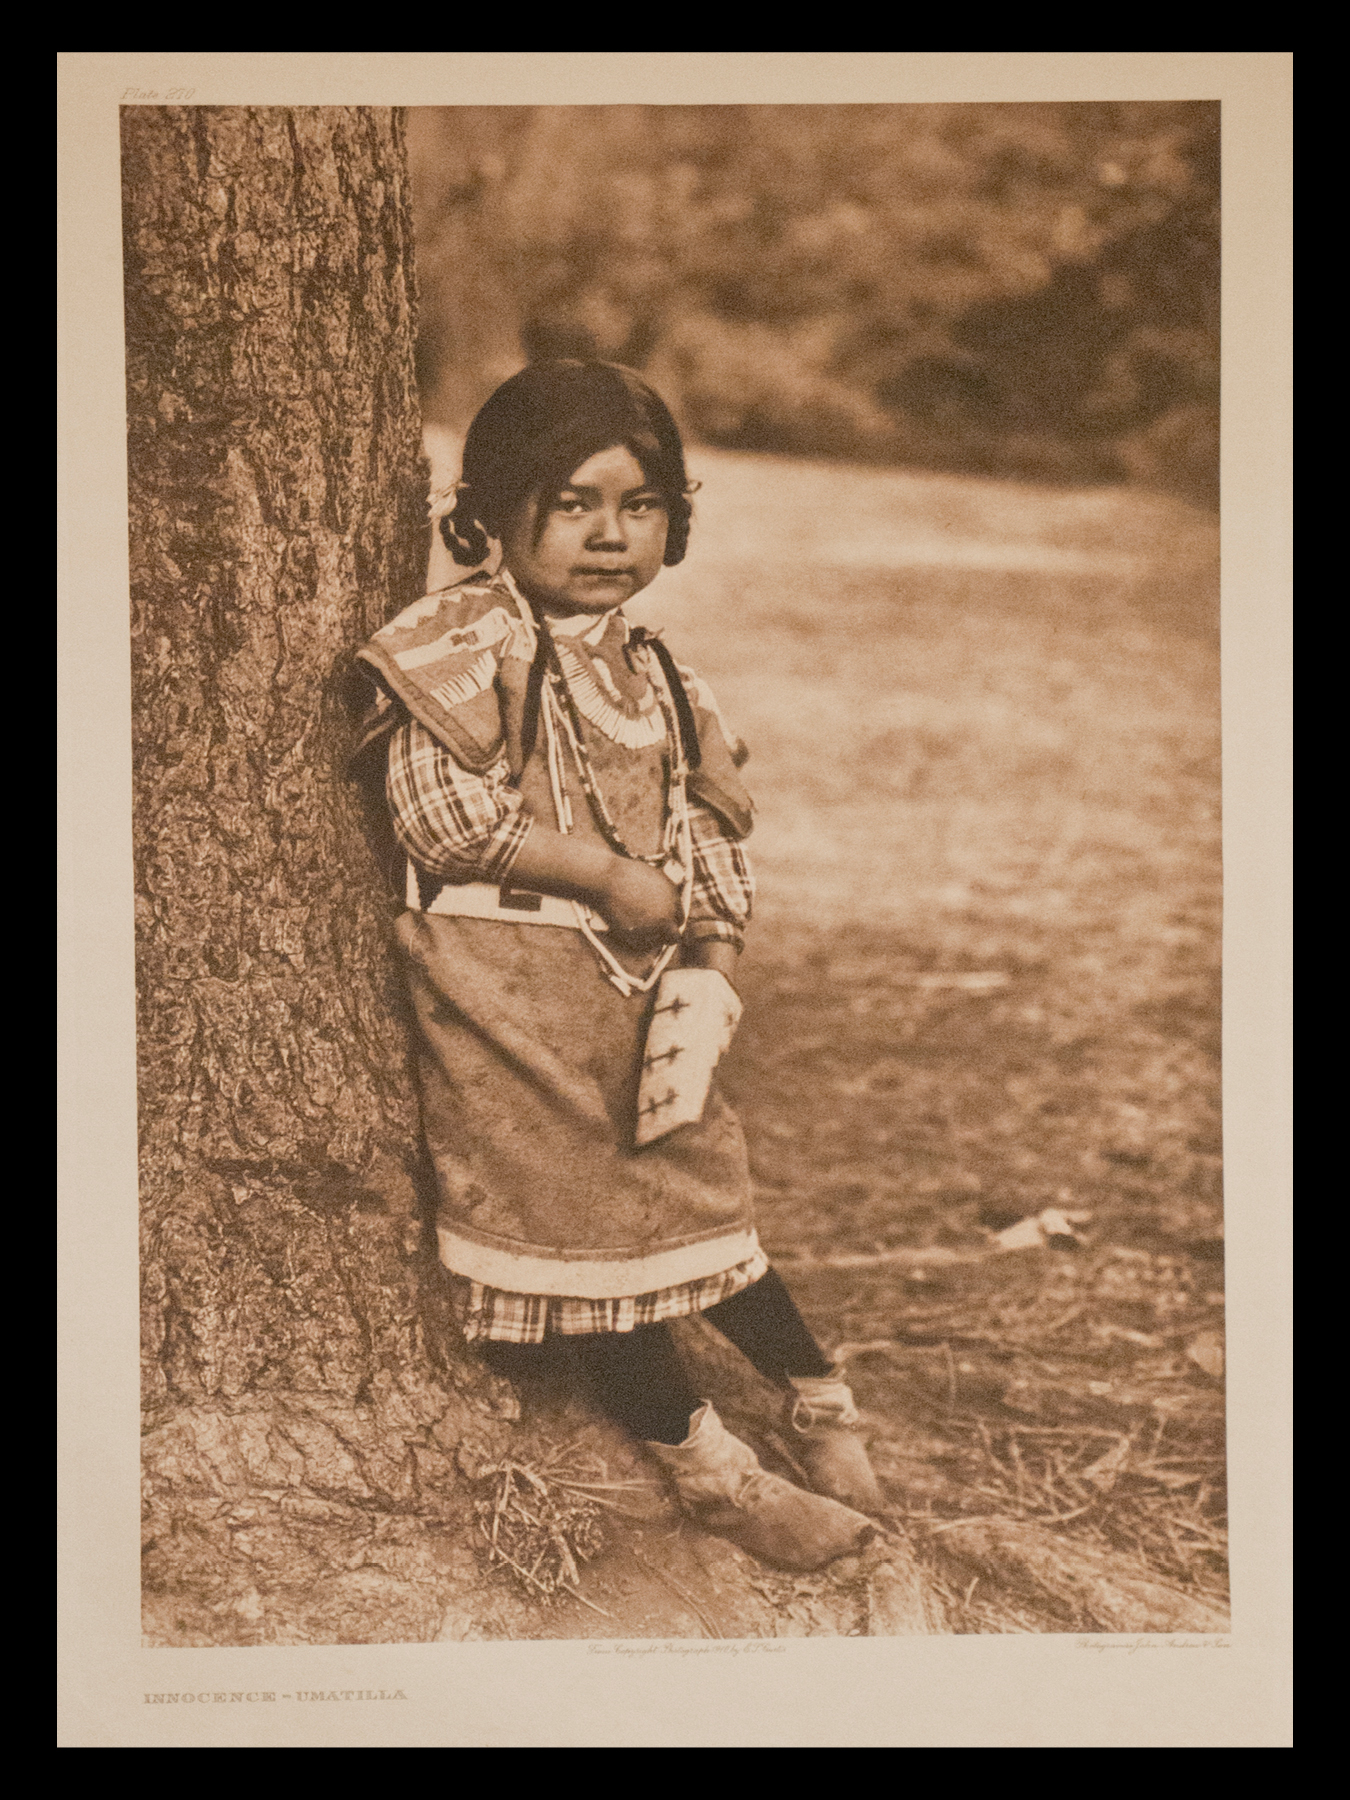 "Plate #270 ""Innocence-Umatilla"" 1910 Portfolio 8"